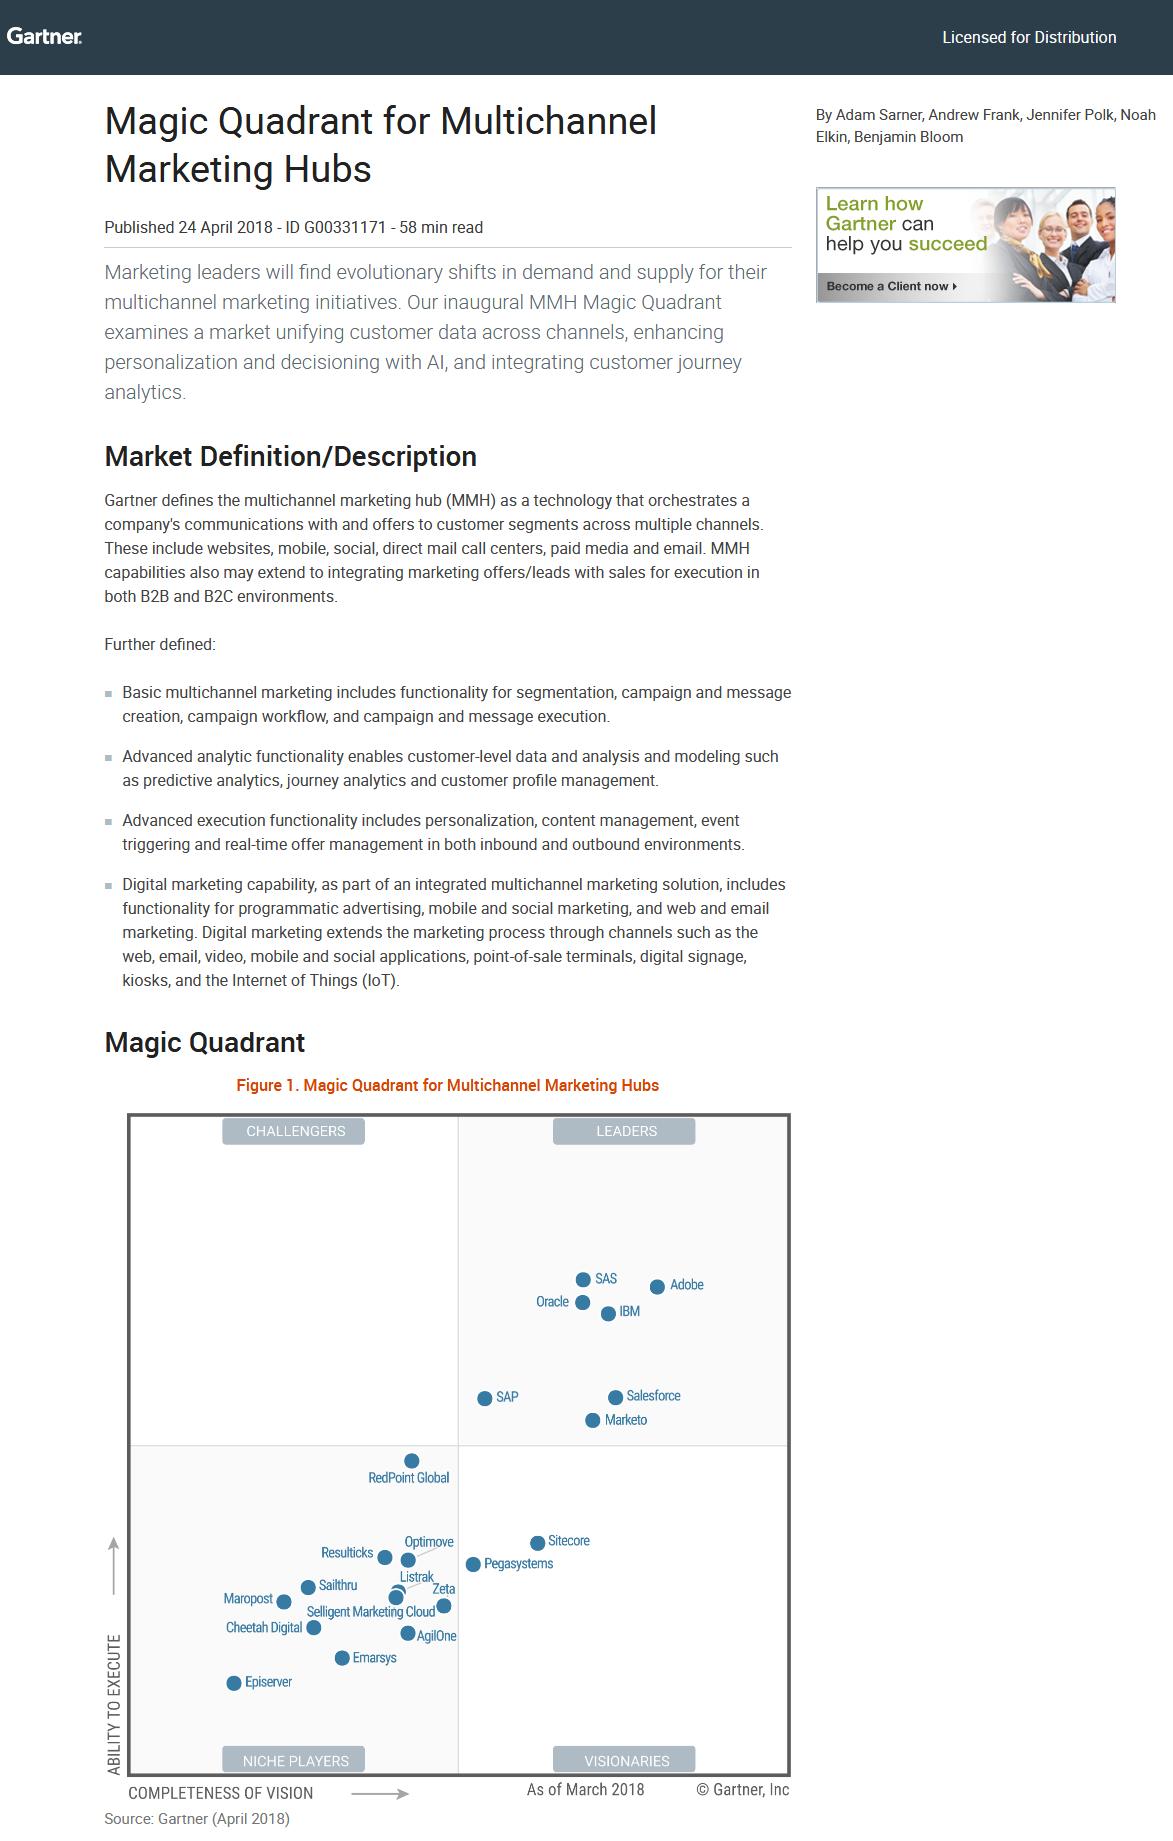 Magic Quadrant for Multichannel Marketing Hubs